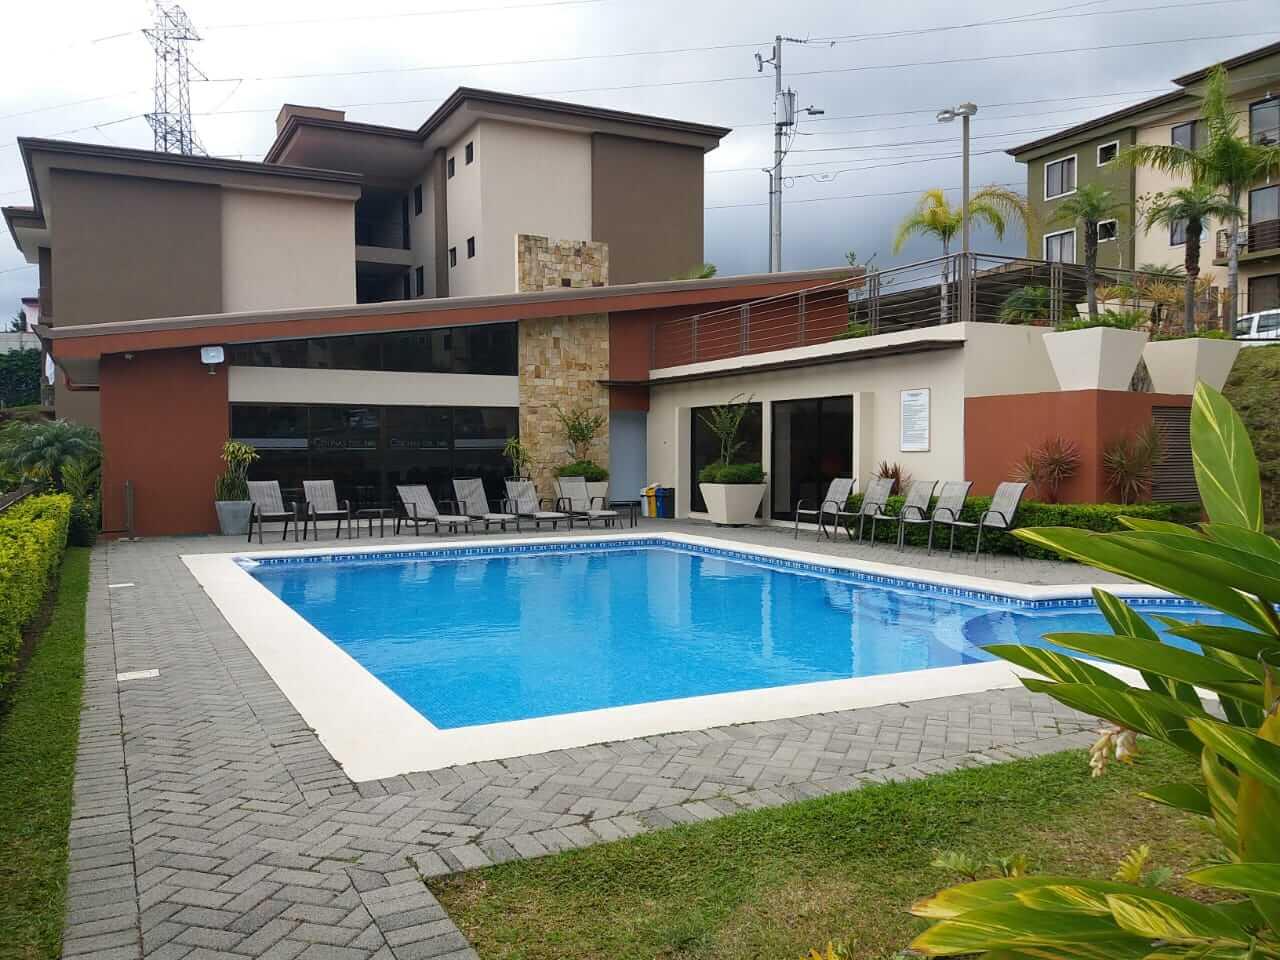 Venta Apartamento en Torres del Sol, carretera vieja a Tres Rios